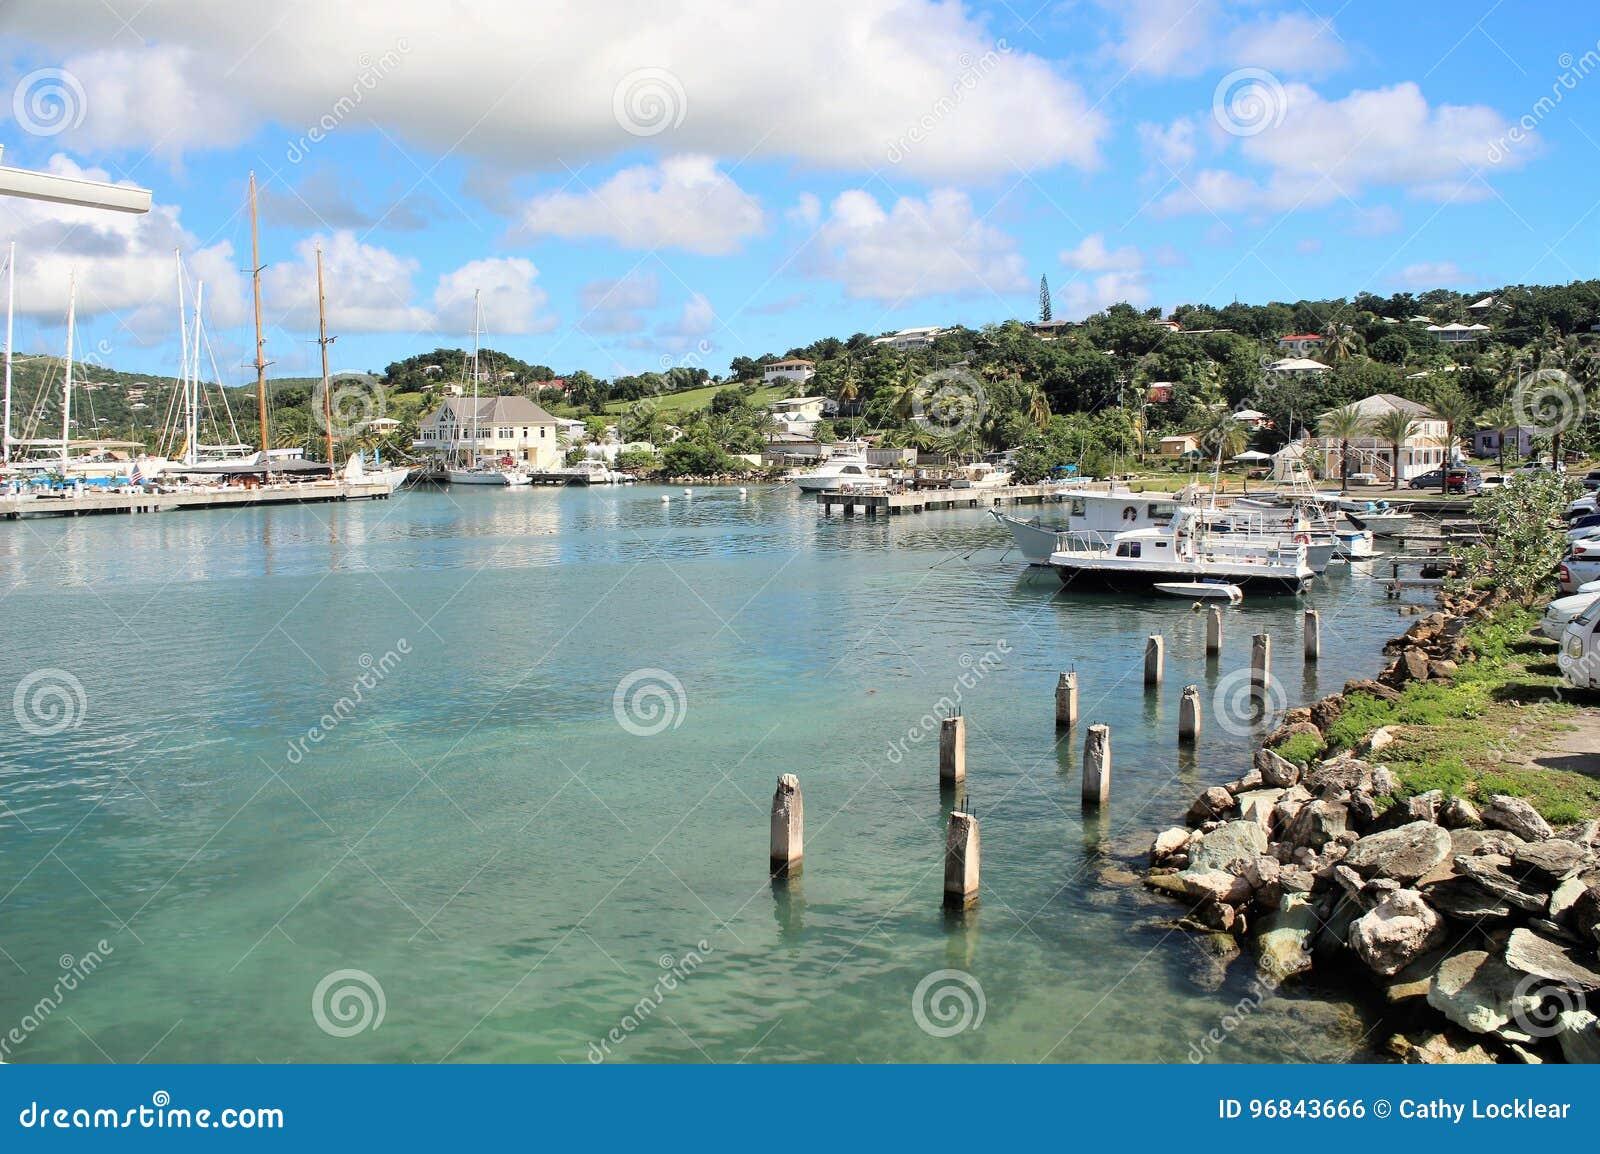 Boats and yahts docked - December 4, 2016 - boast and yachts docked at a Marina on the island of Antigua